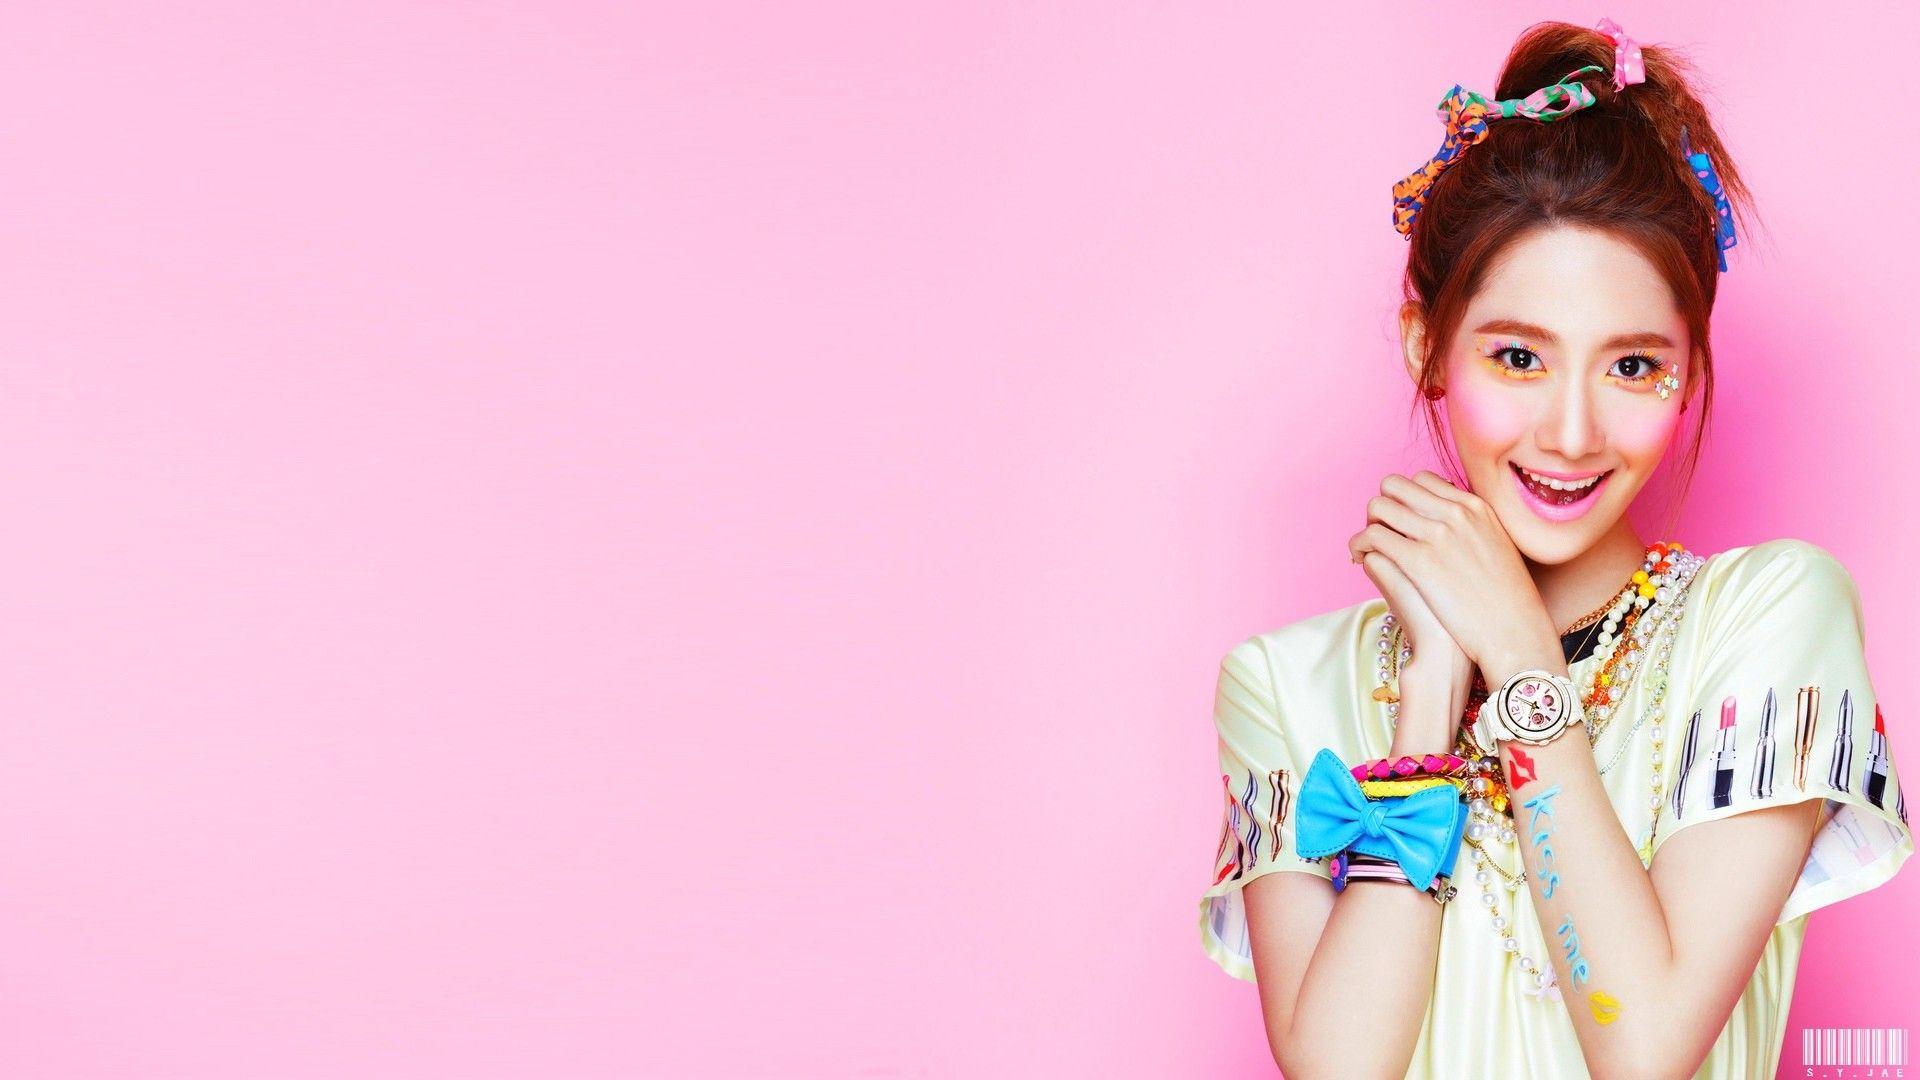 HD] 131023 Girls' Generation (SNSD) - 2013 Real BABY G Making Film ...